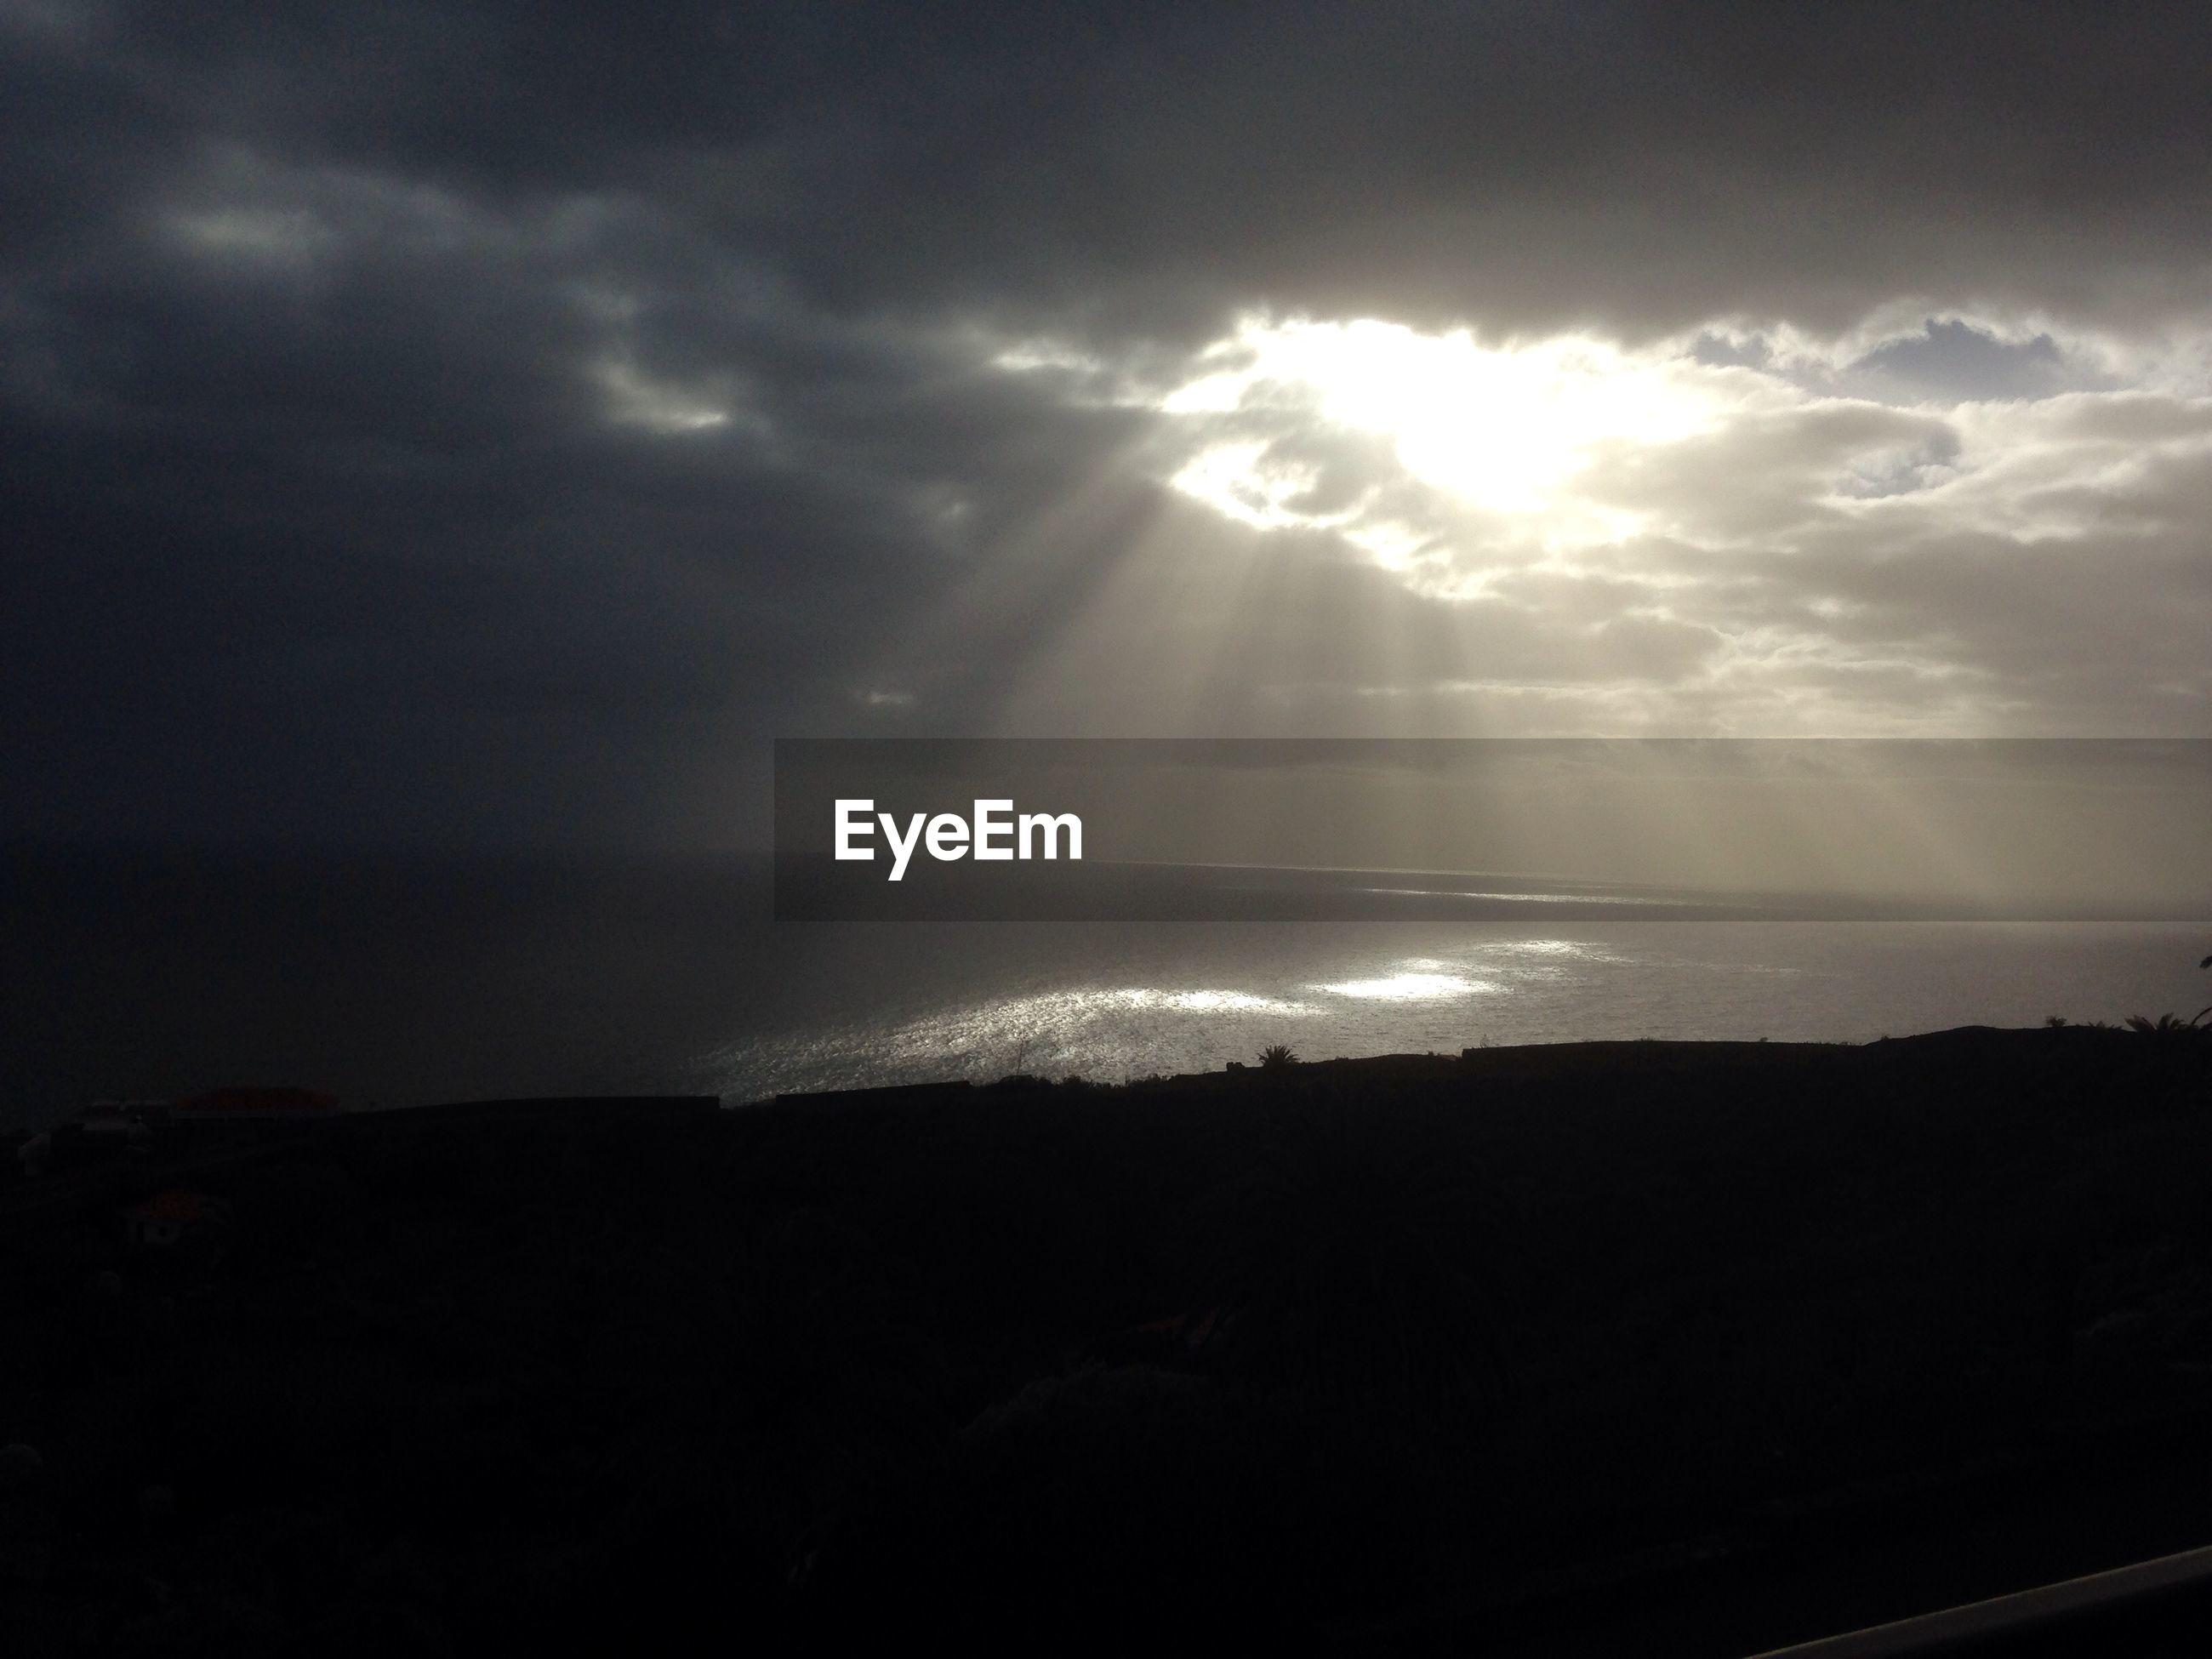 Sunlight emitting through clouds over sea